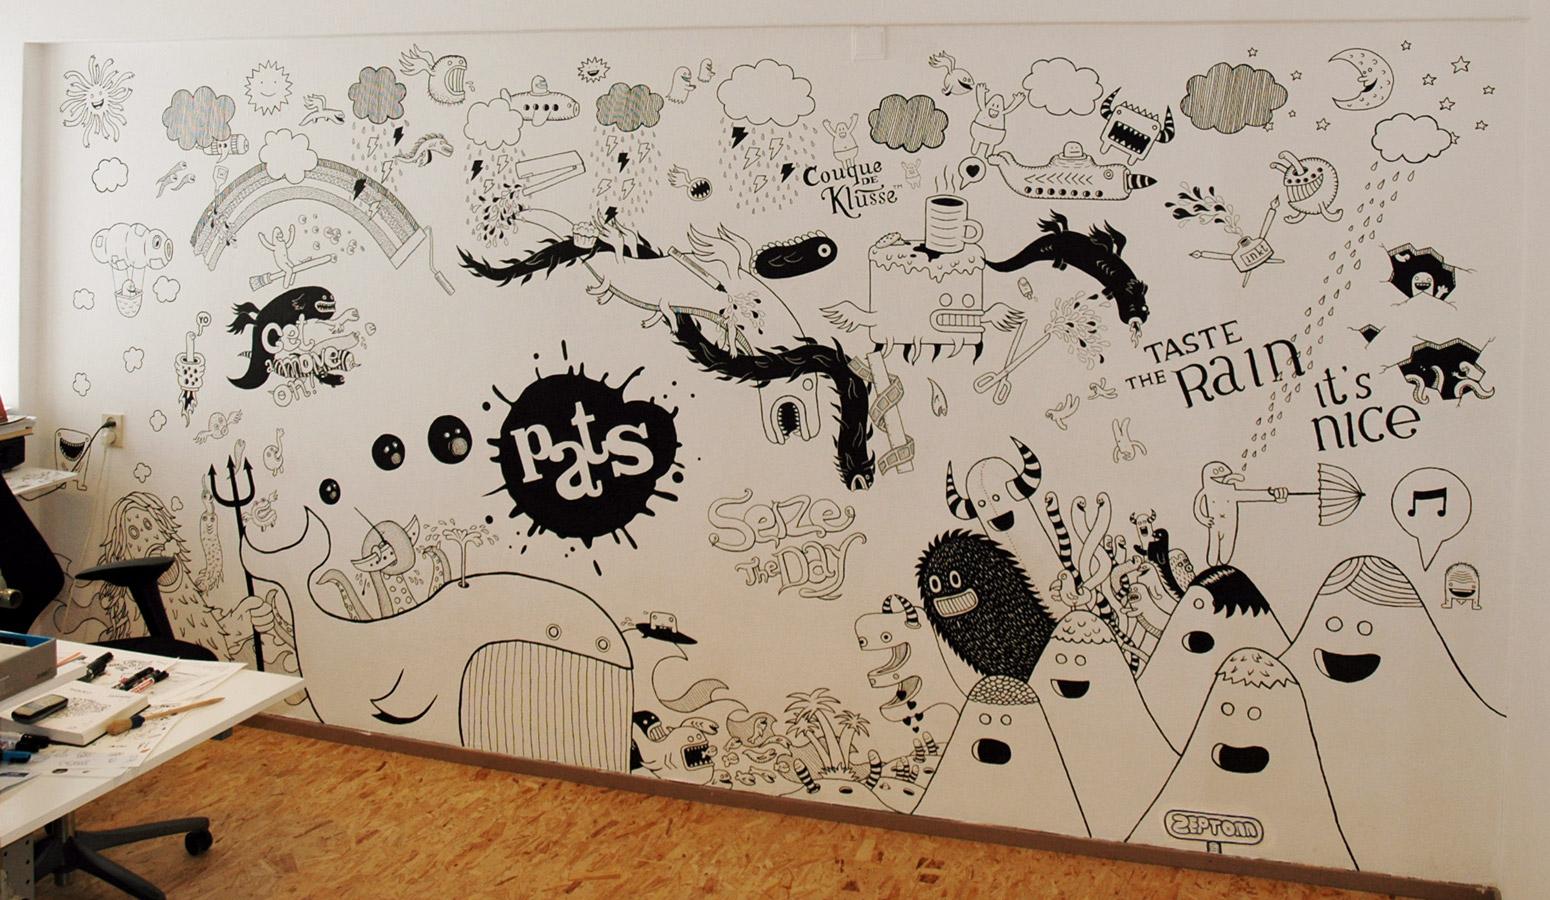 Viscom year 1 february 2011 for Cool wall art drawings